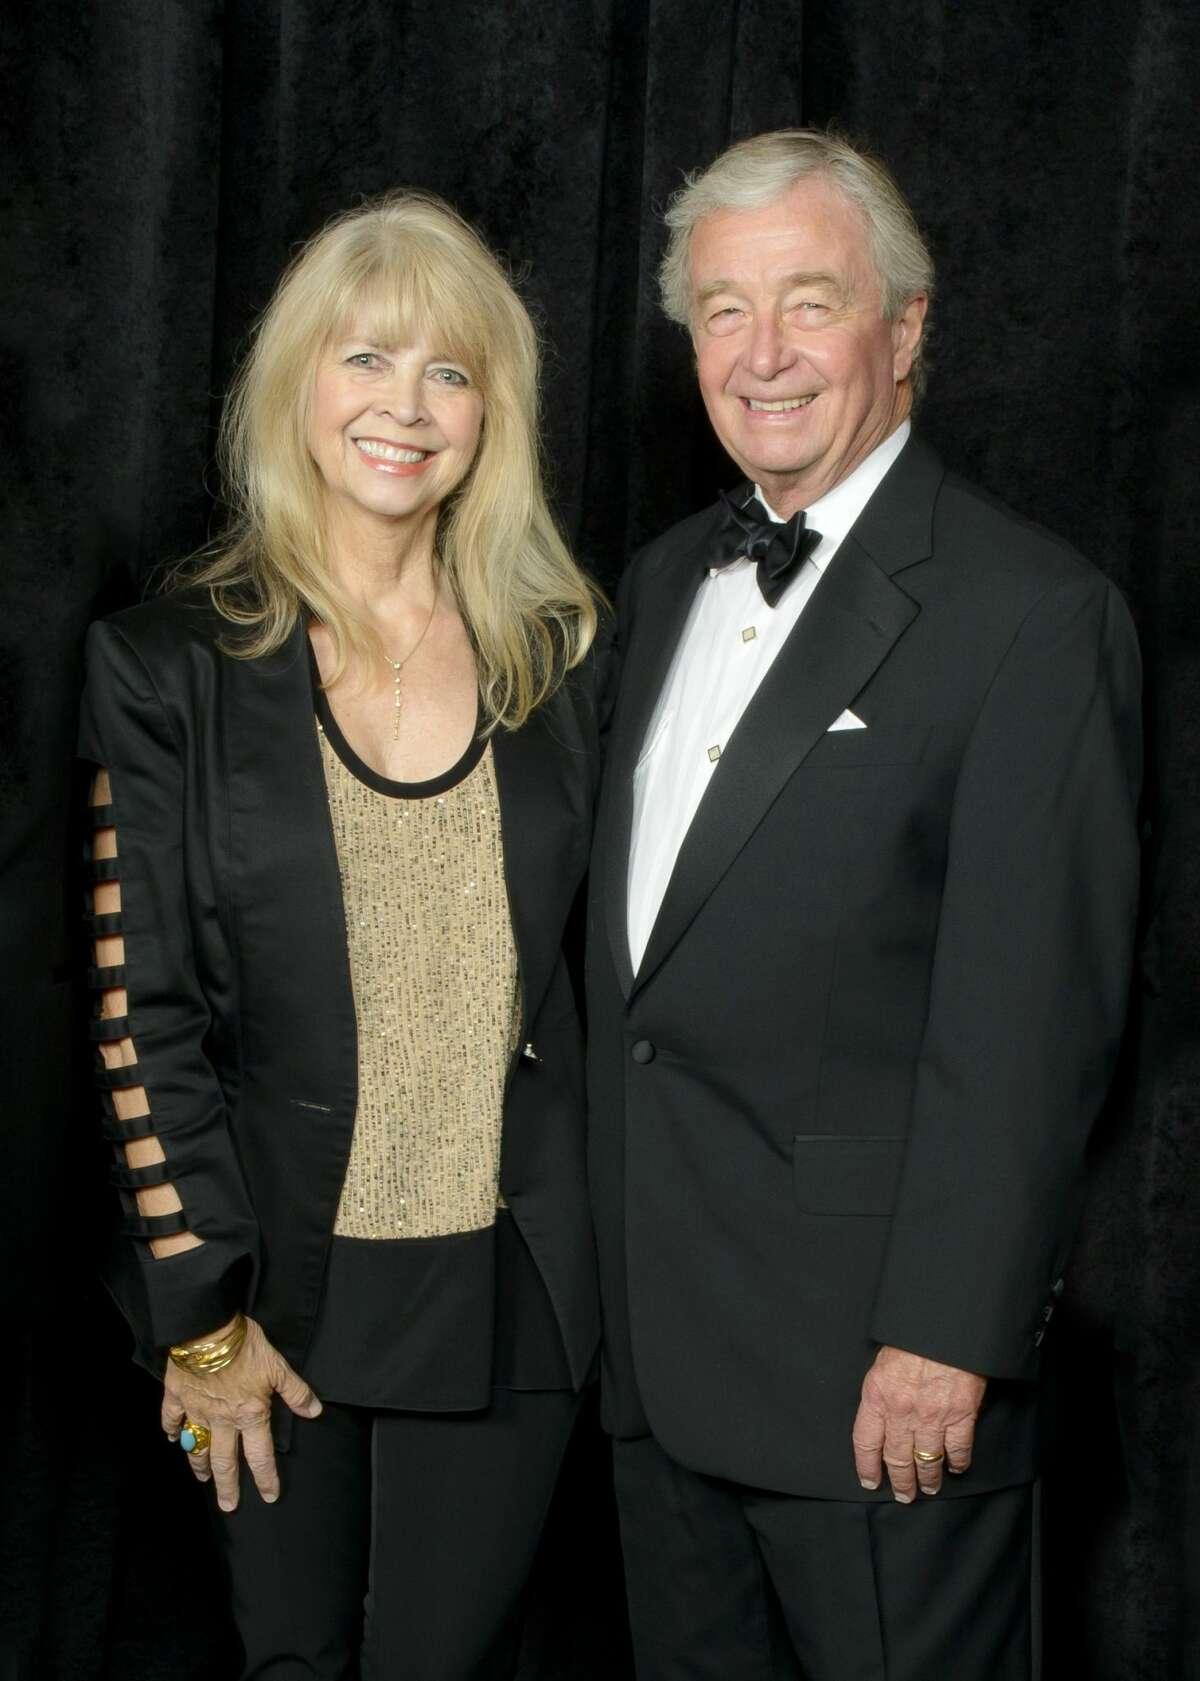 Janie DeGuerin and Dick DeGuerin